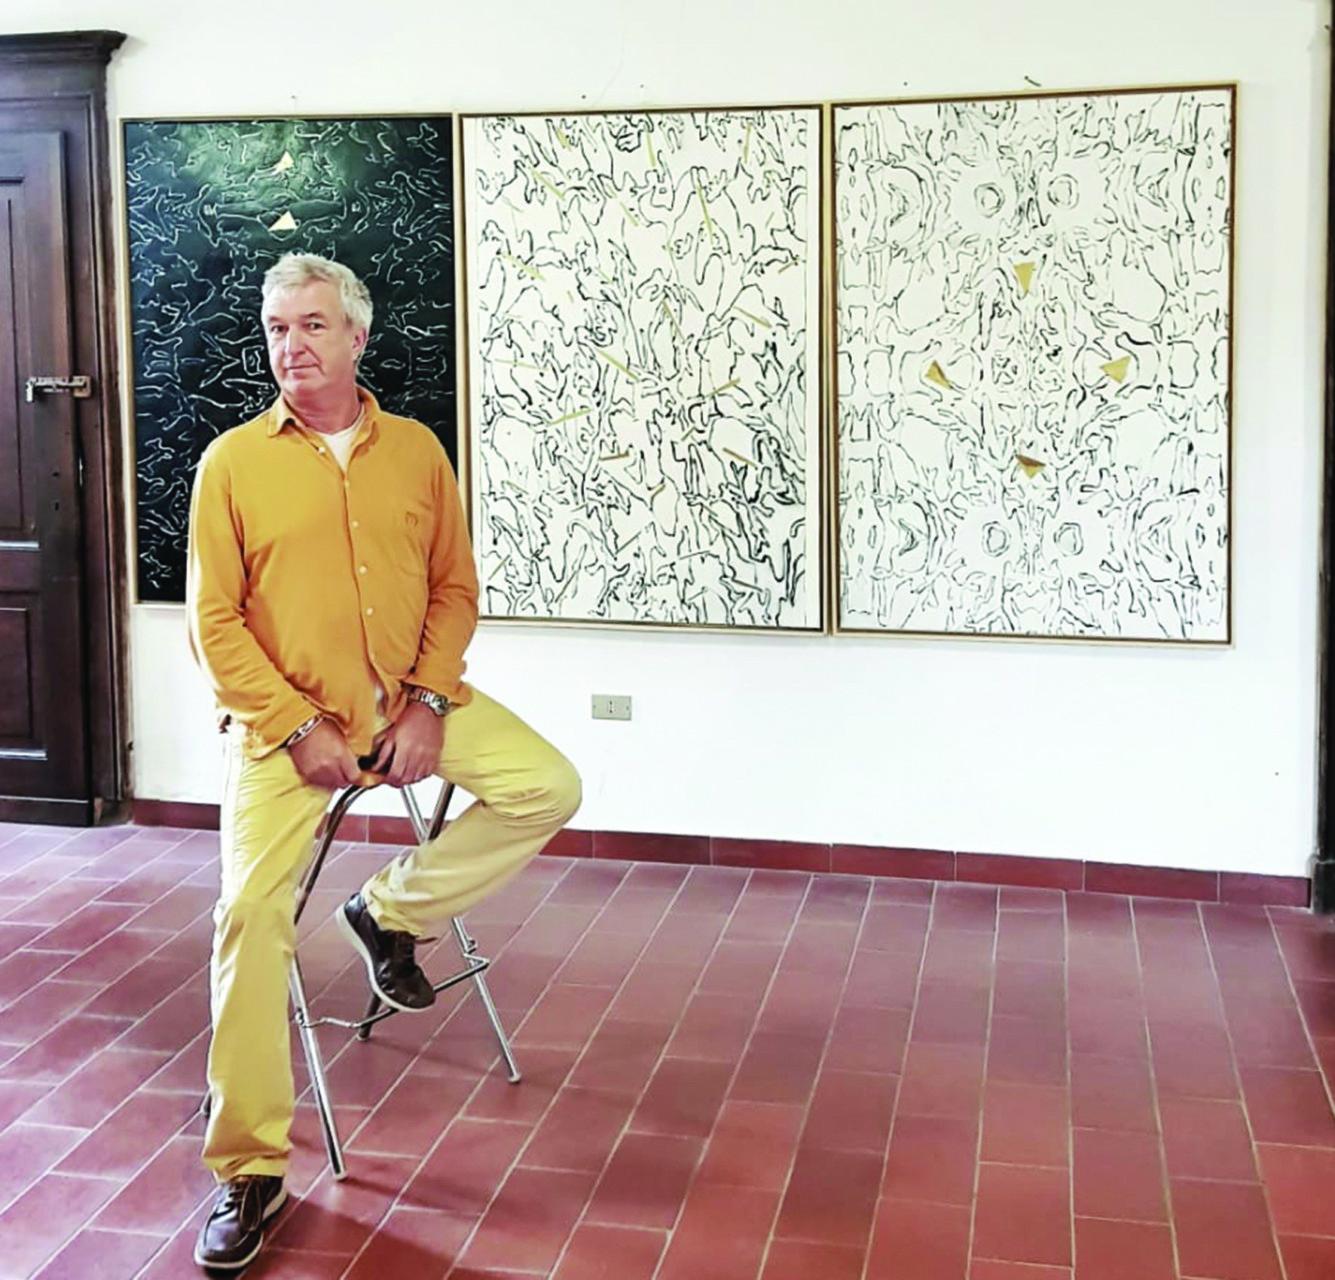 2019 Giorgio Piccaia nel suo atelier foto Ahmed Barakat 1